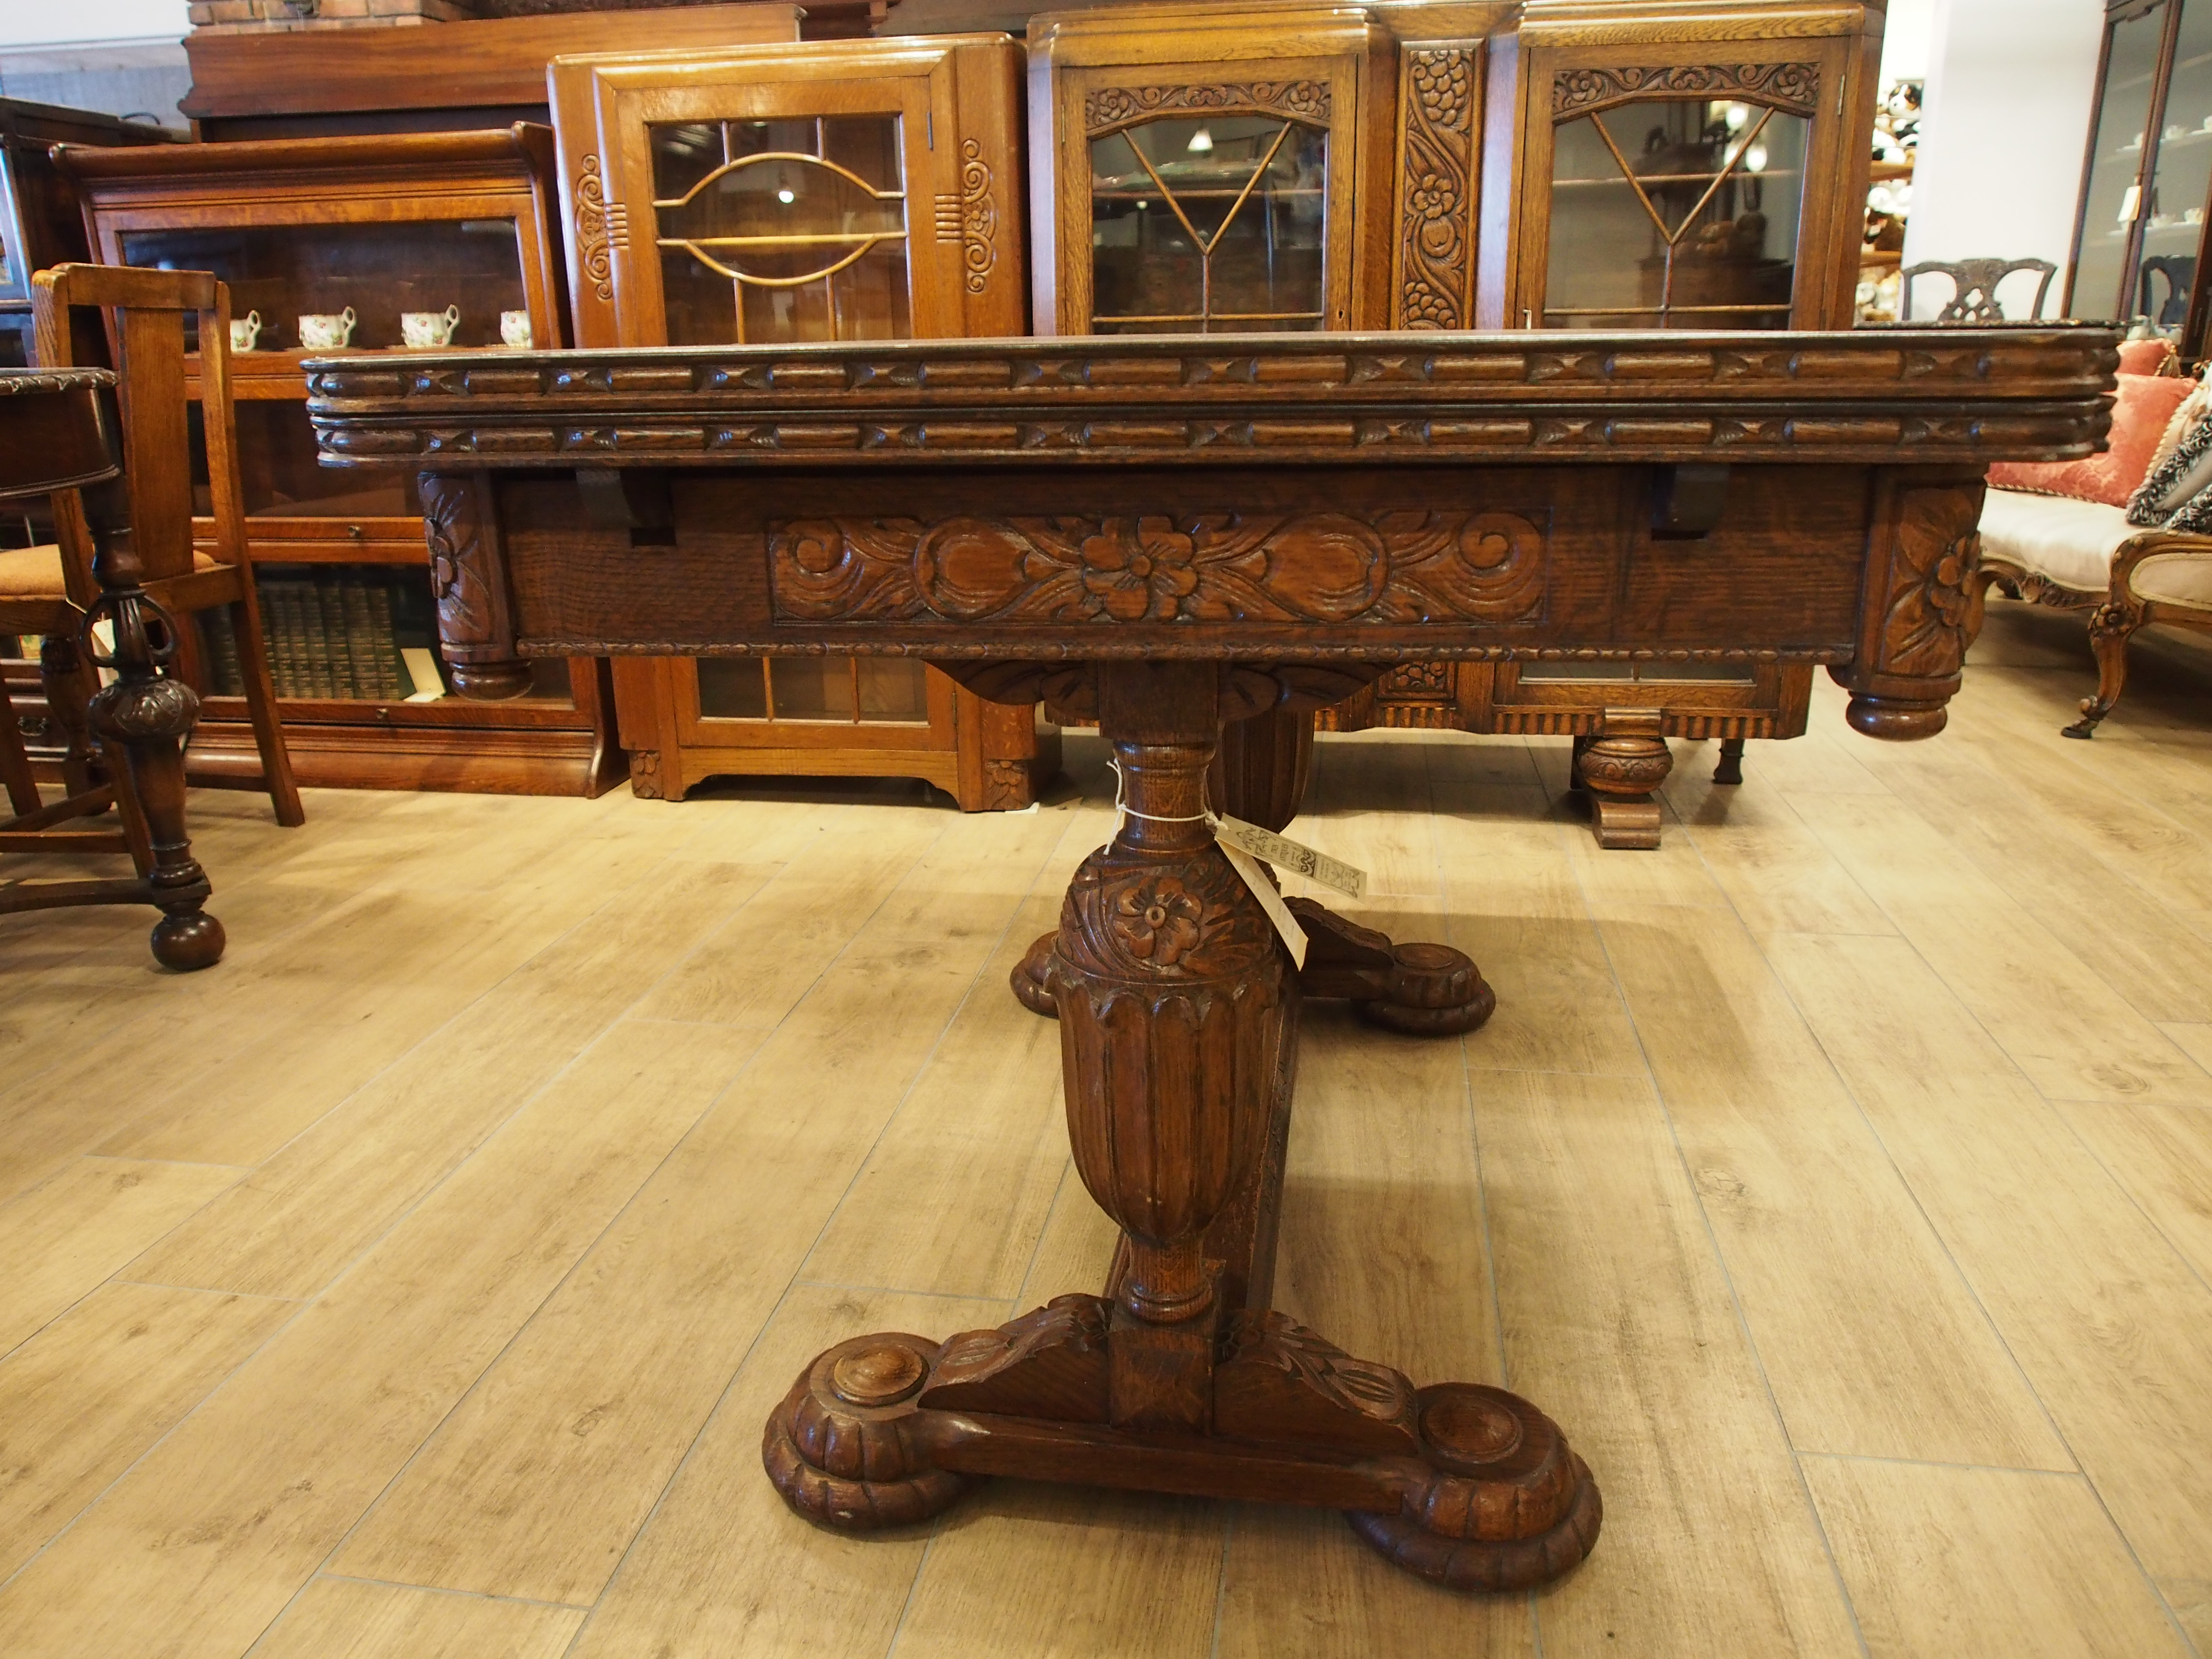 OLYMPUS DIGITAL アンティーク家具 箕面 ダイニングテーブル テーブル 伸縮式 二本脚 ドローリーフテーブル カップアンドカバー 彫刻 ヴィンテージ家具 ビンテージ家具 イギリスアンティーク家具  イギリス 英国家具 イギリス家具